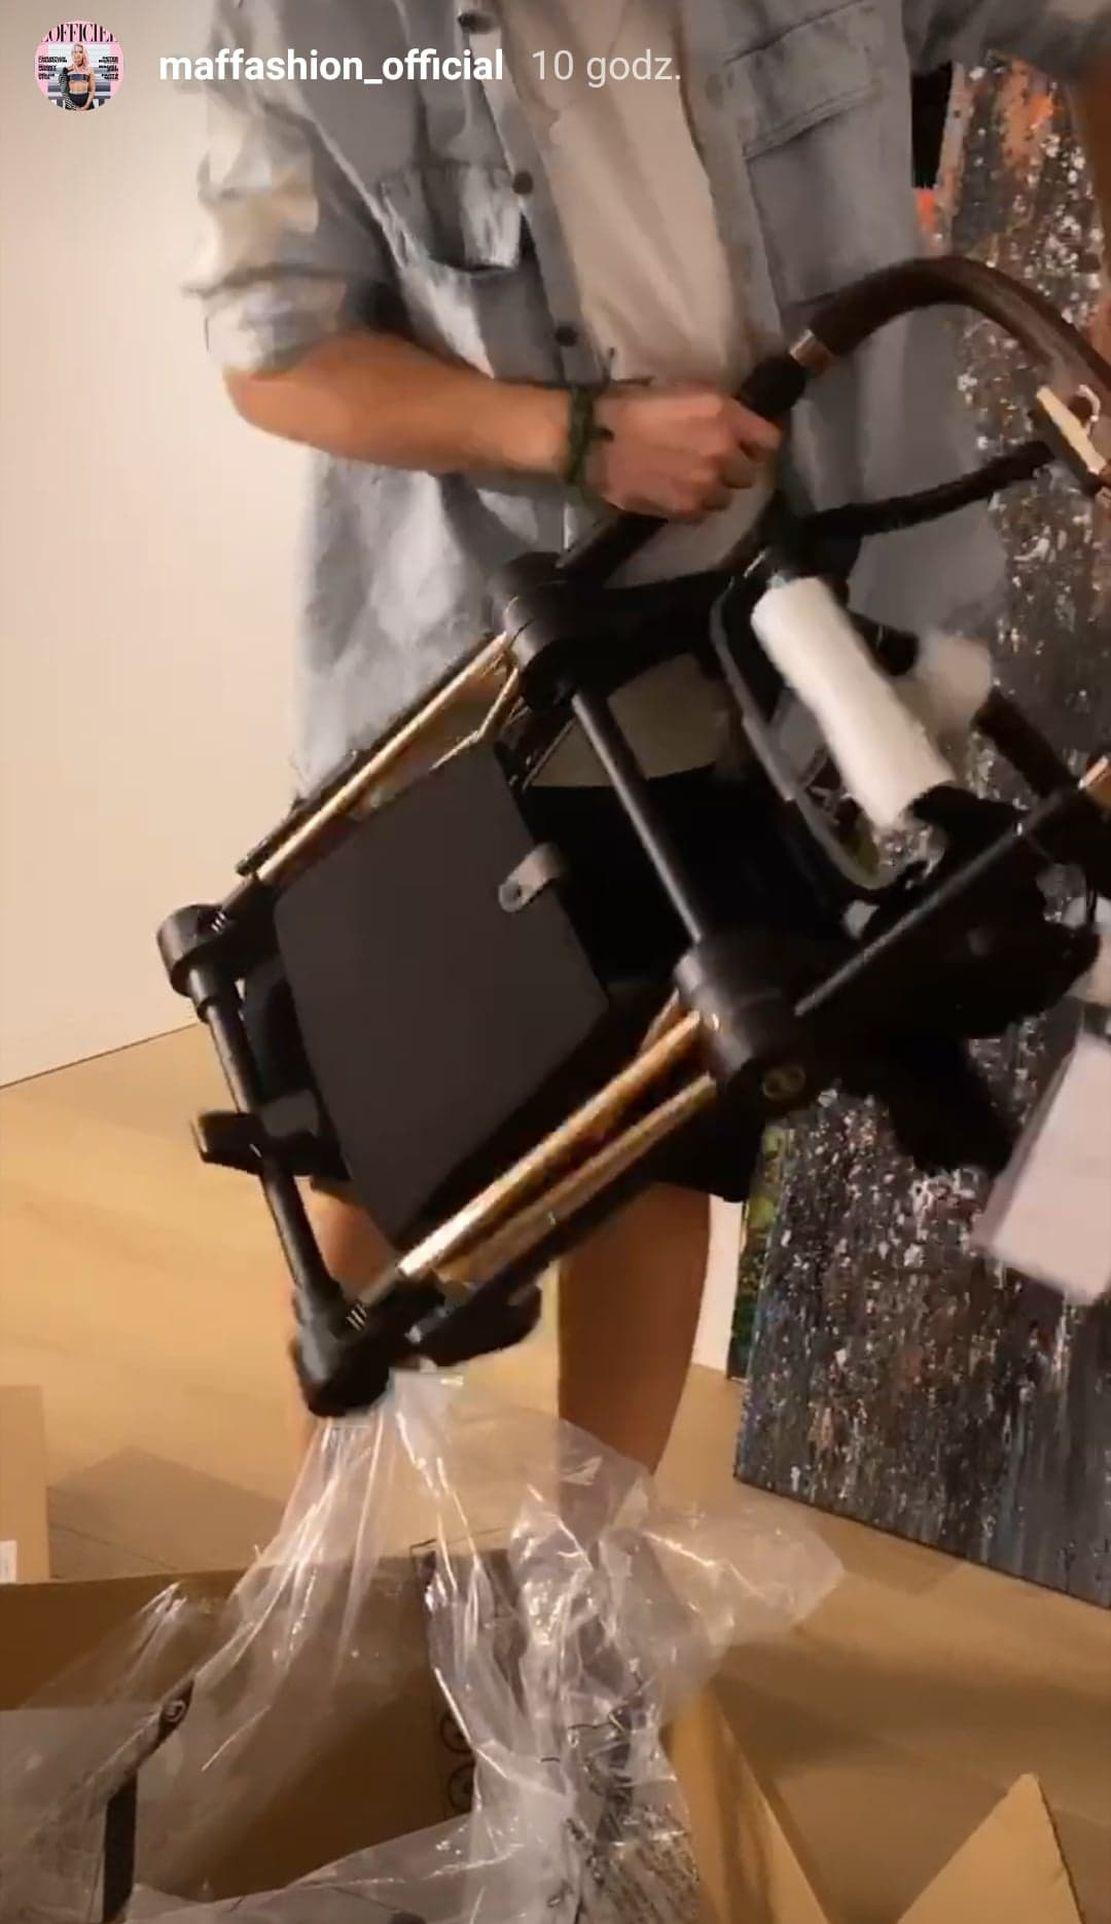 Sebastian Fabijański składa wózek